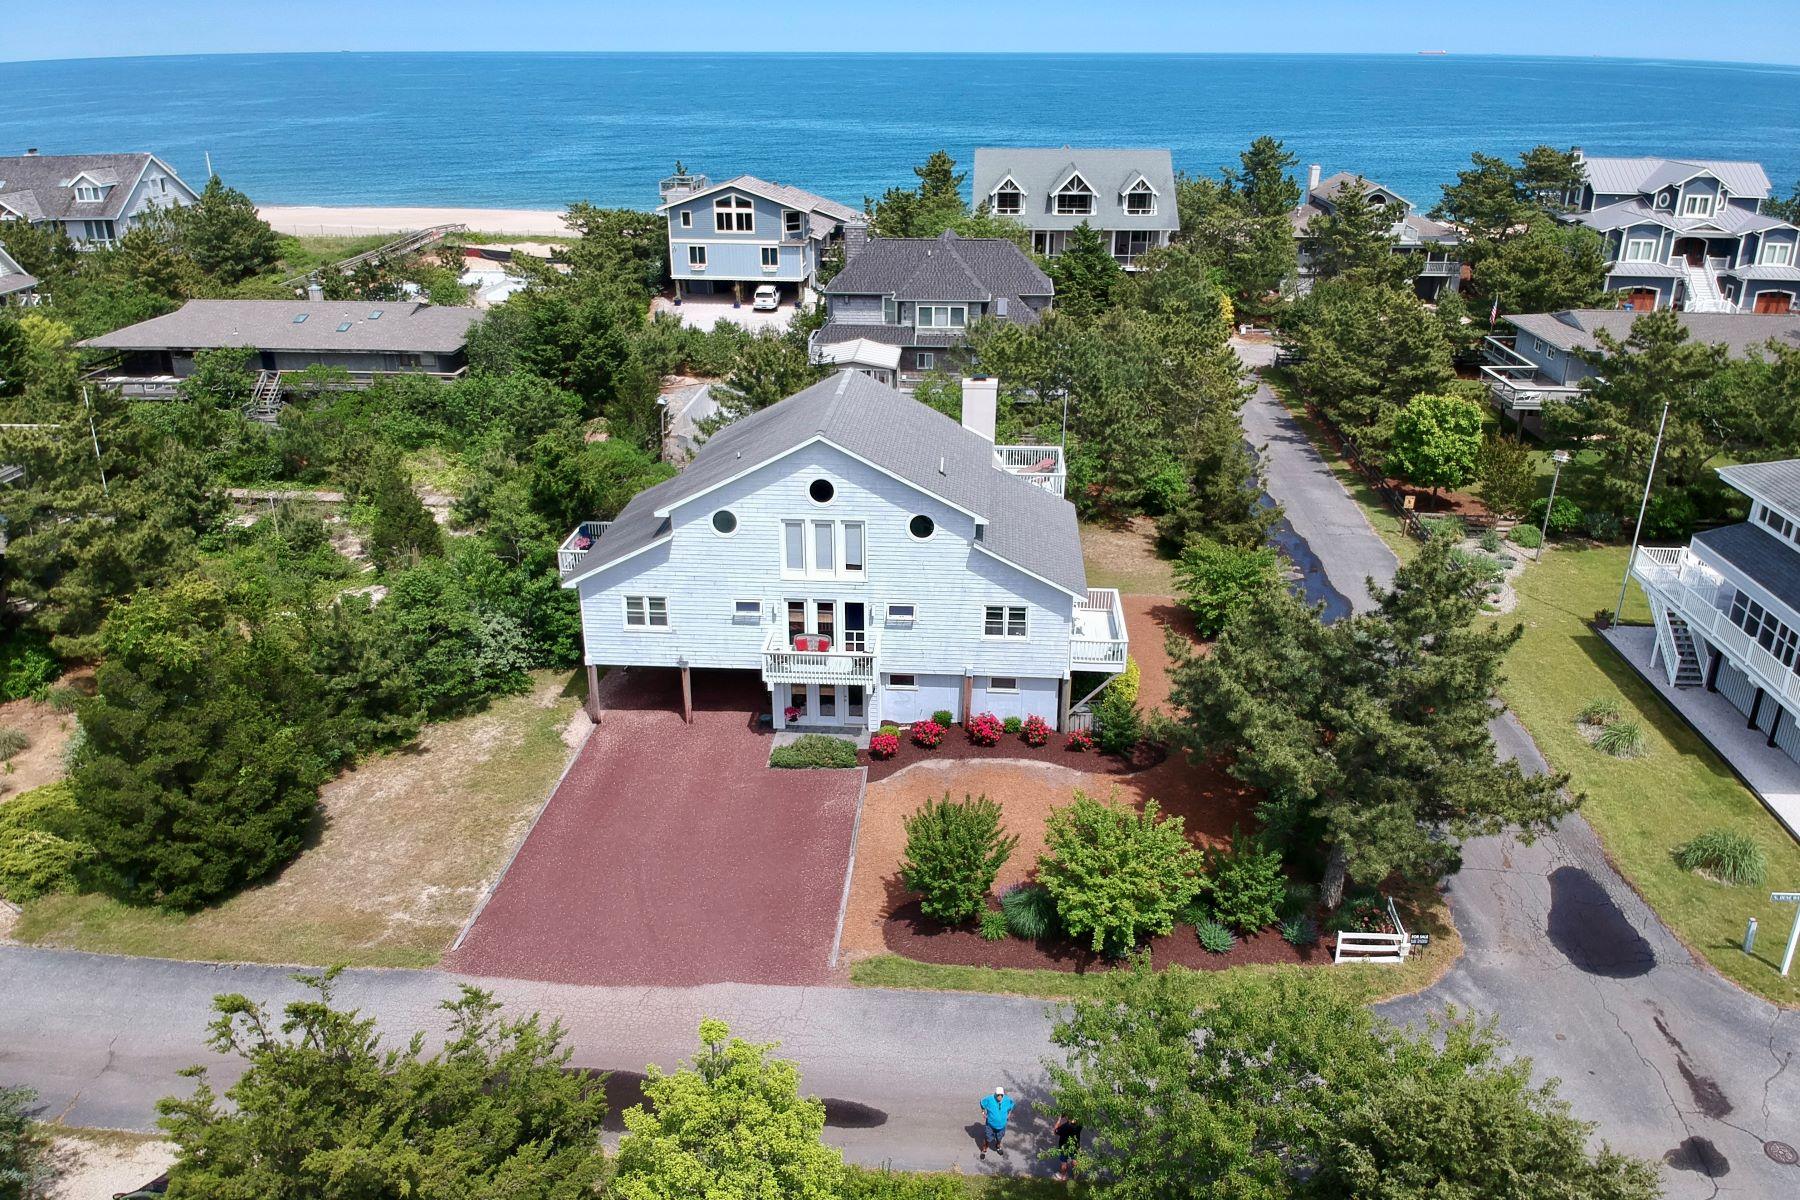 single family homes 为 销售 在 29541 N. Dune Way 29541 N Dune Way 北伯大尼, 特拉华州 19930 美国